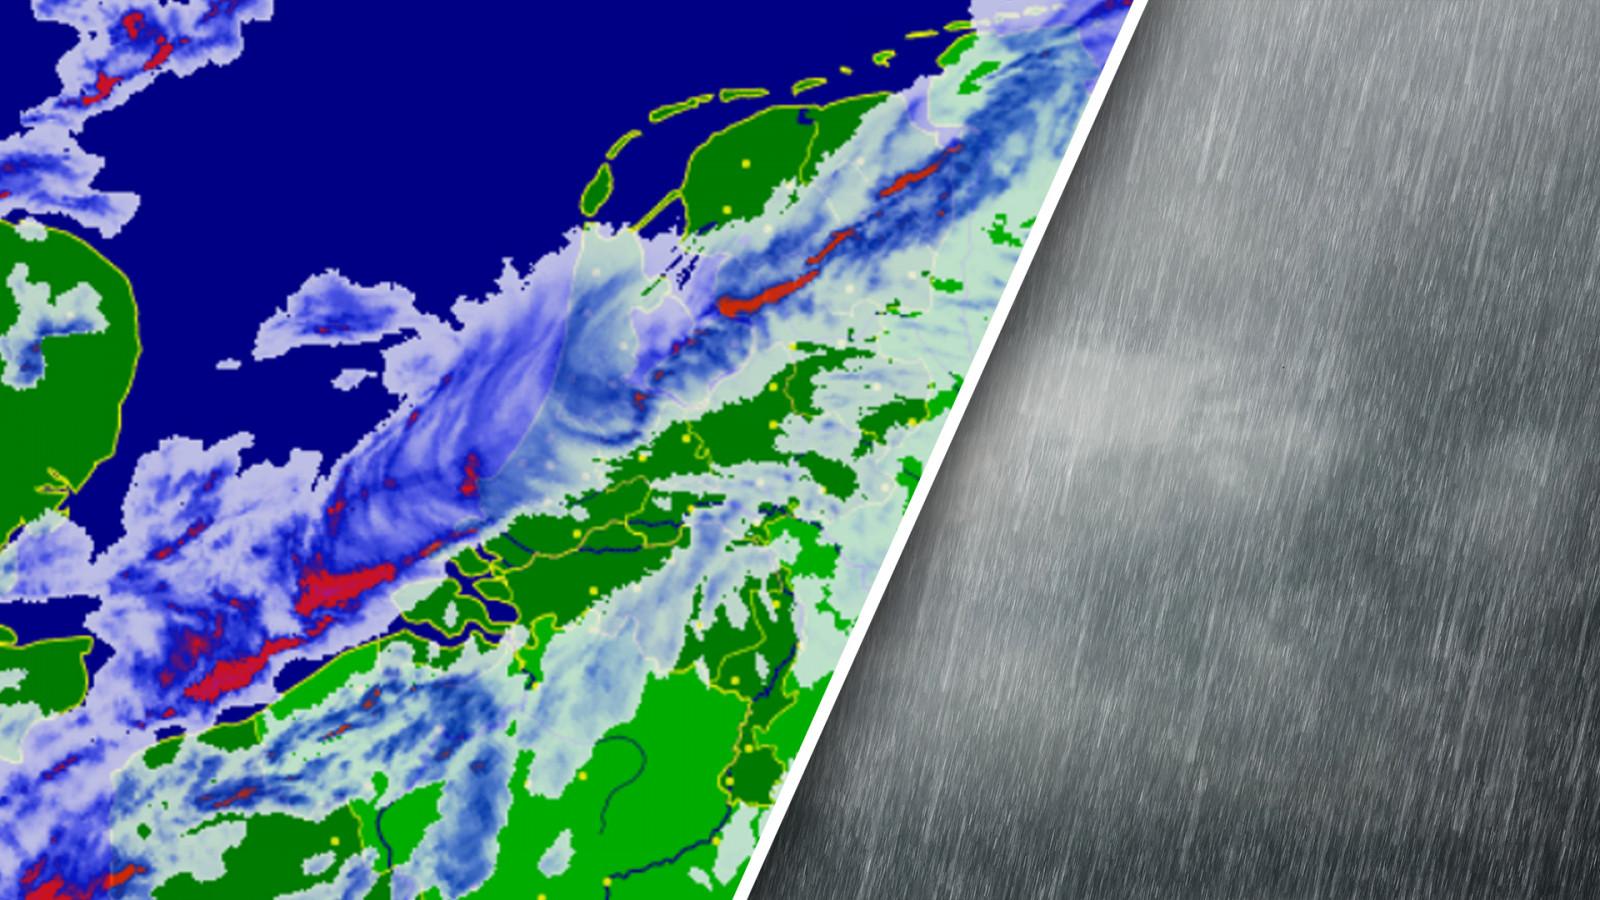 Buienradar.nl / Adobe Stock